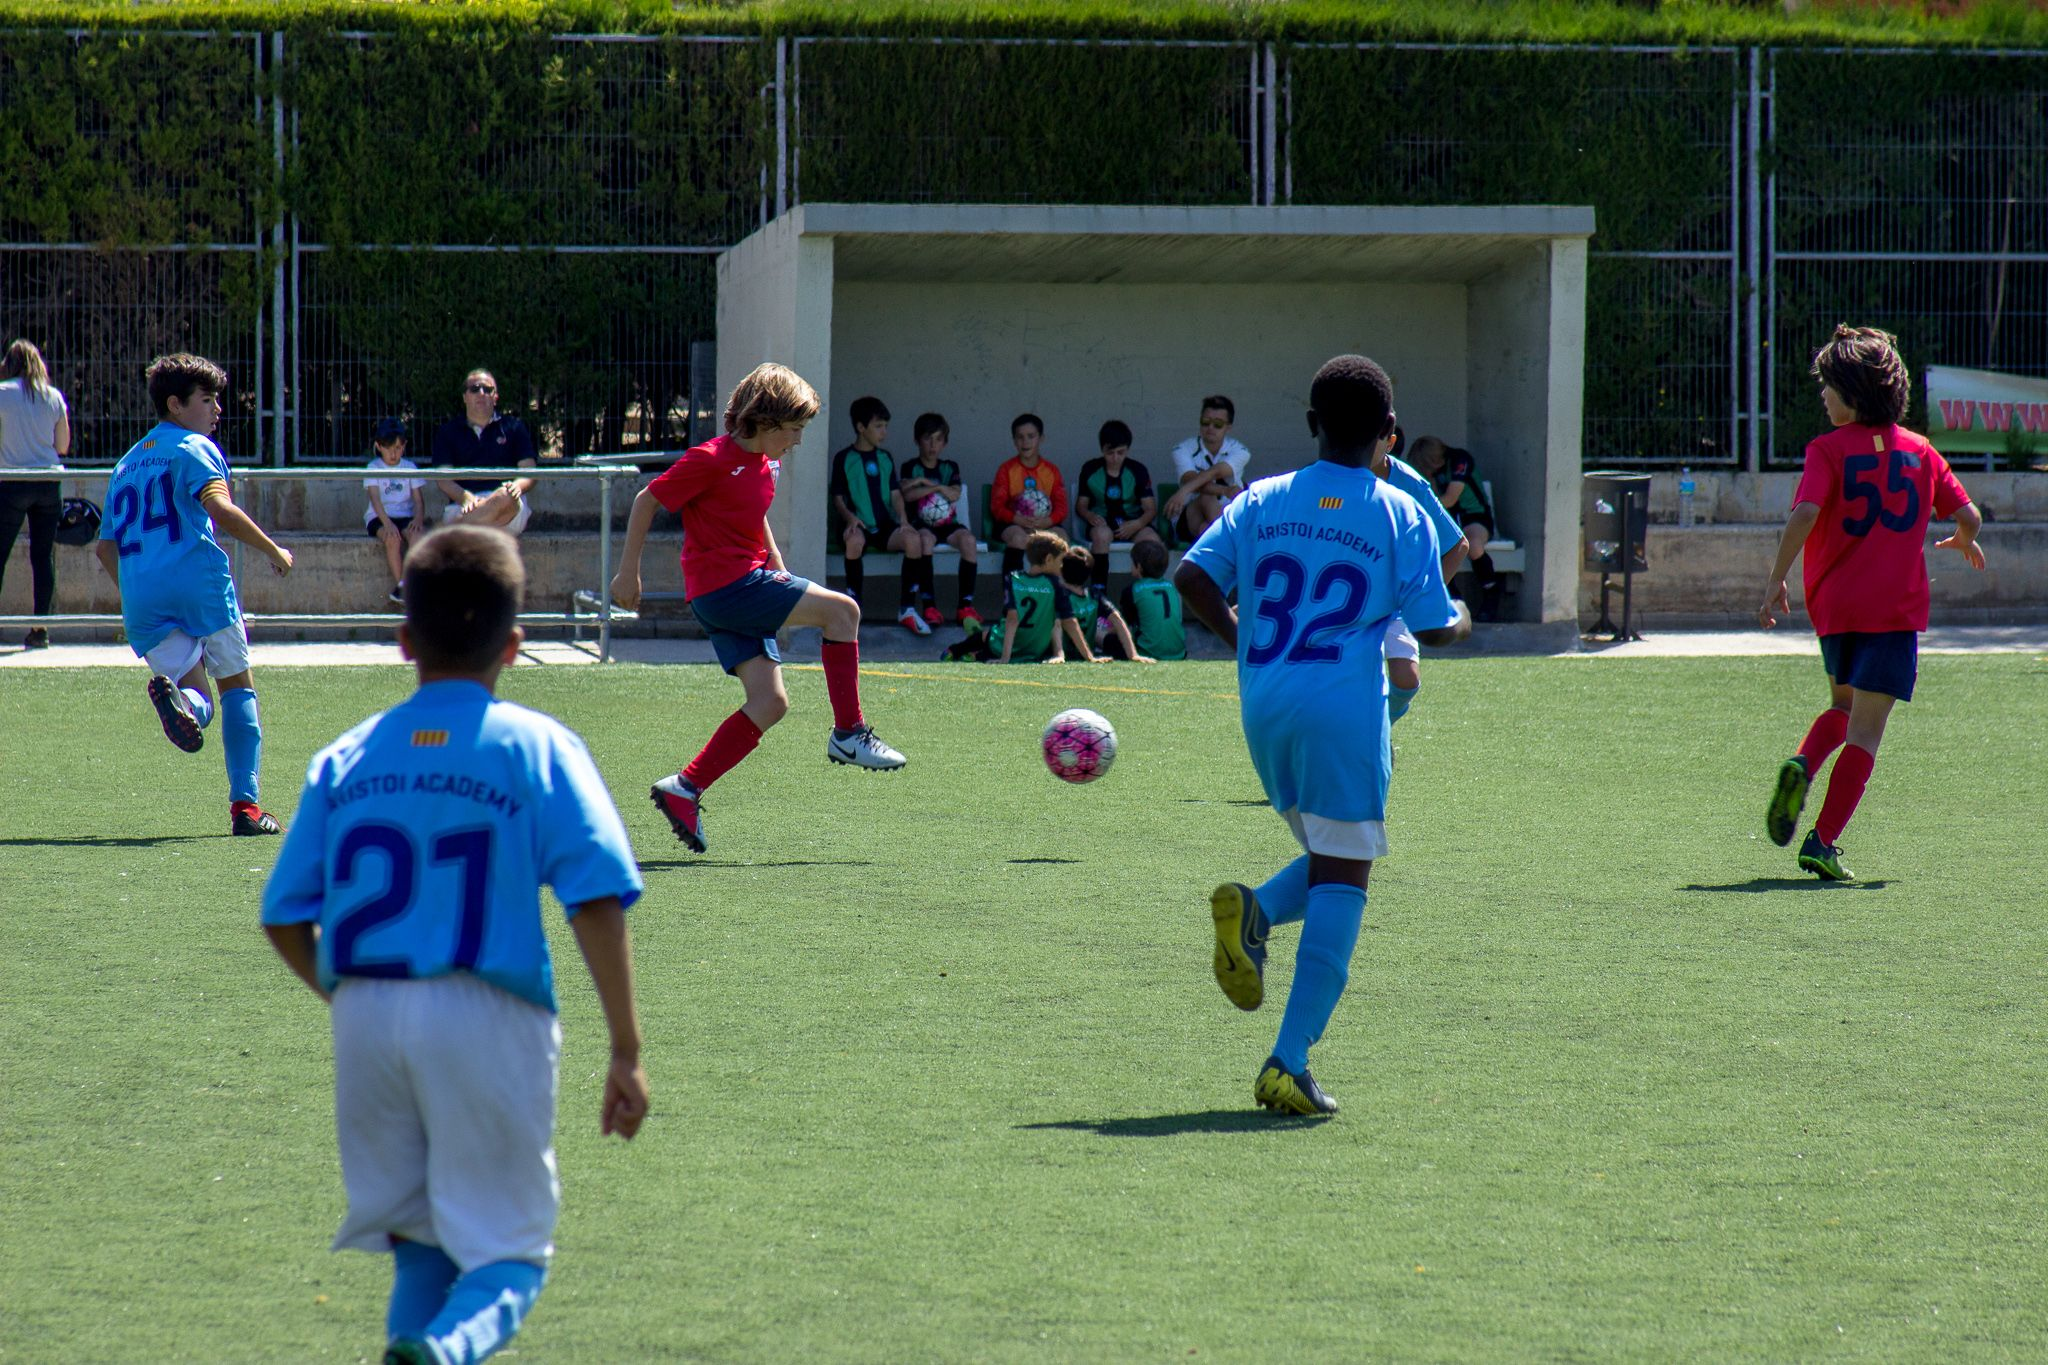 7è Torneig Final de Temporada-4t Memorial Eufrasio Montiel. FOTO: Ale G.